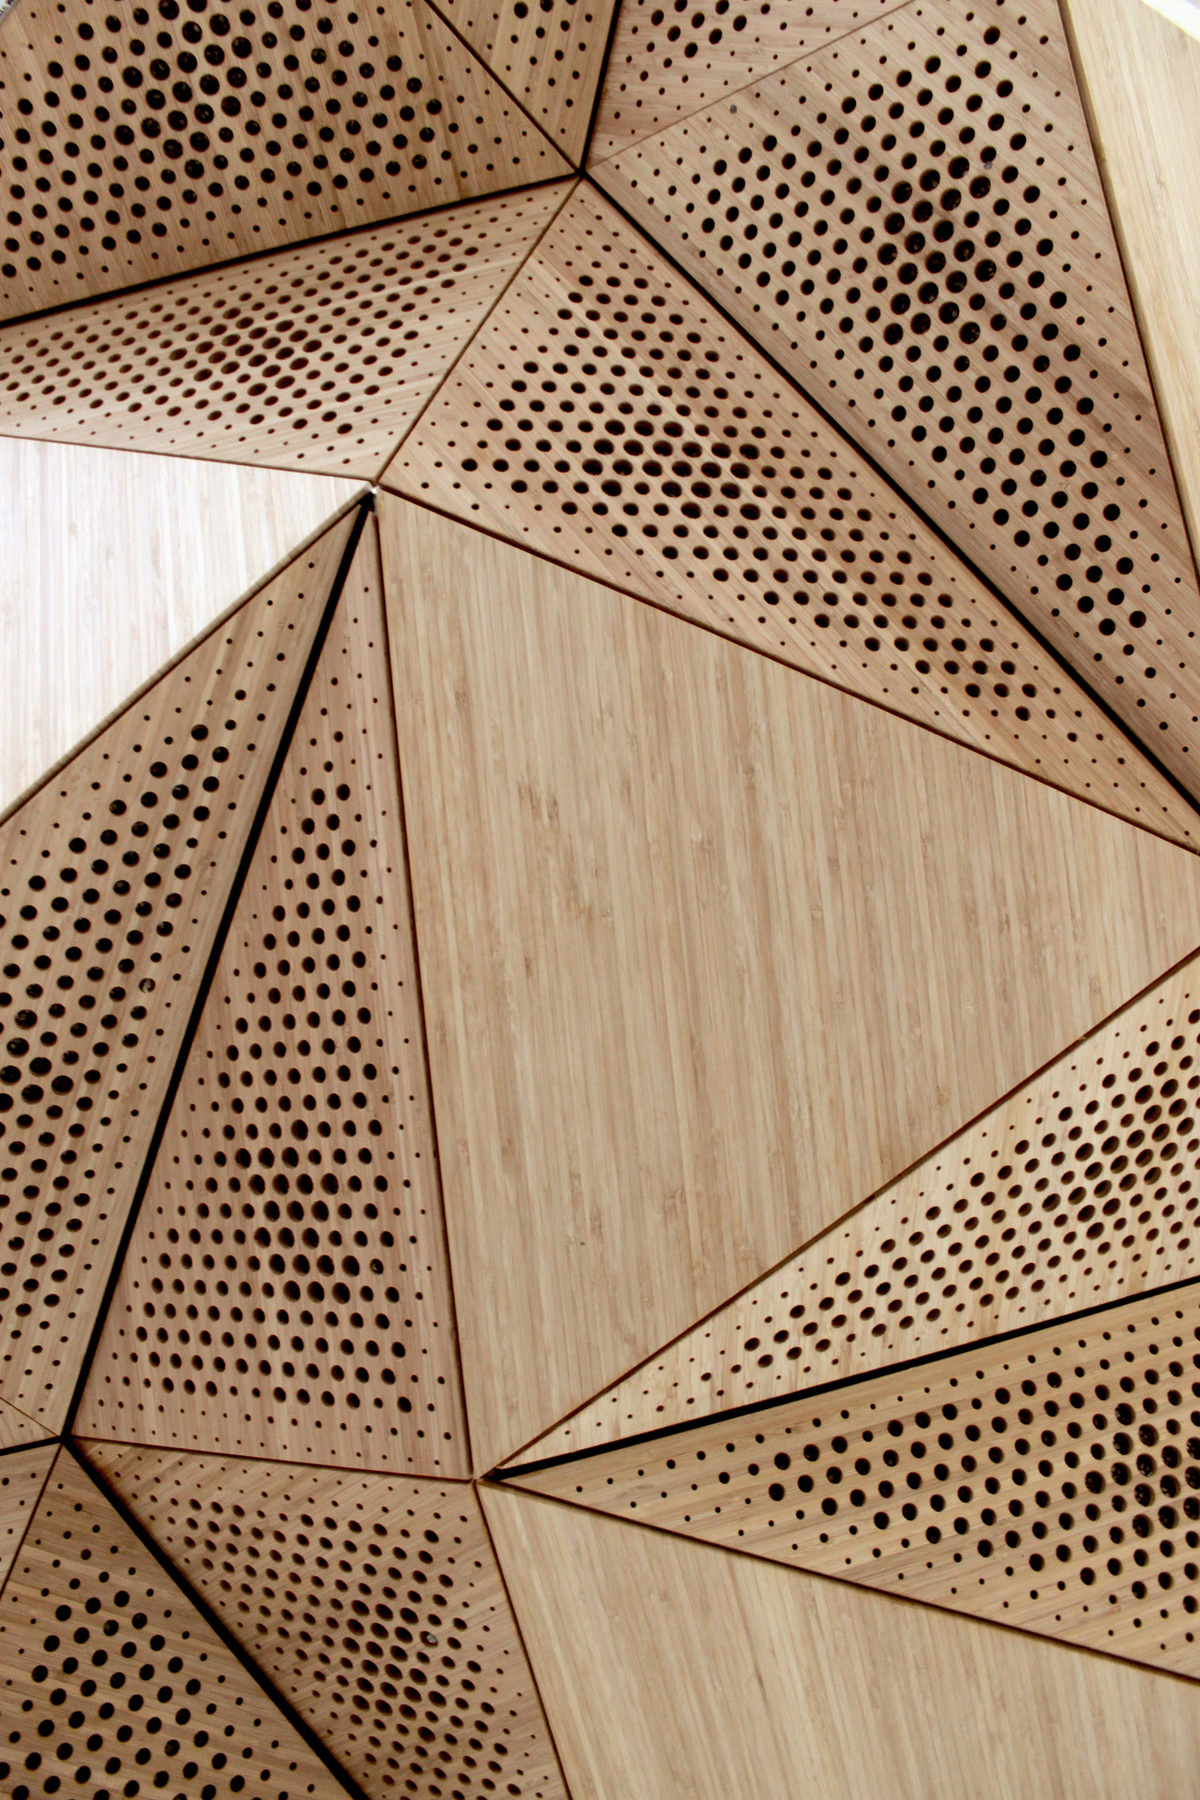 underside of acoustic soffit